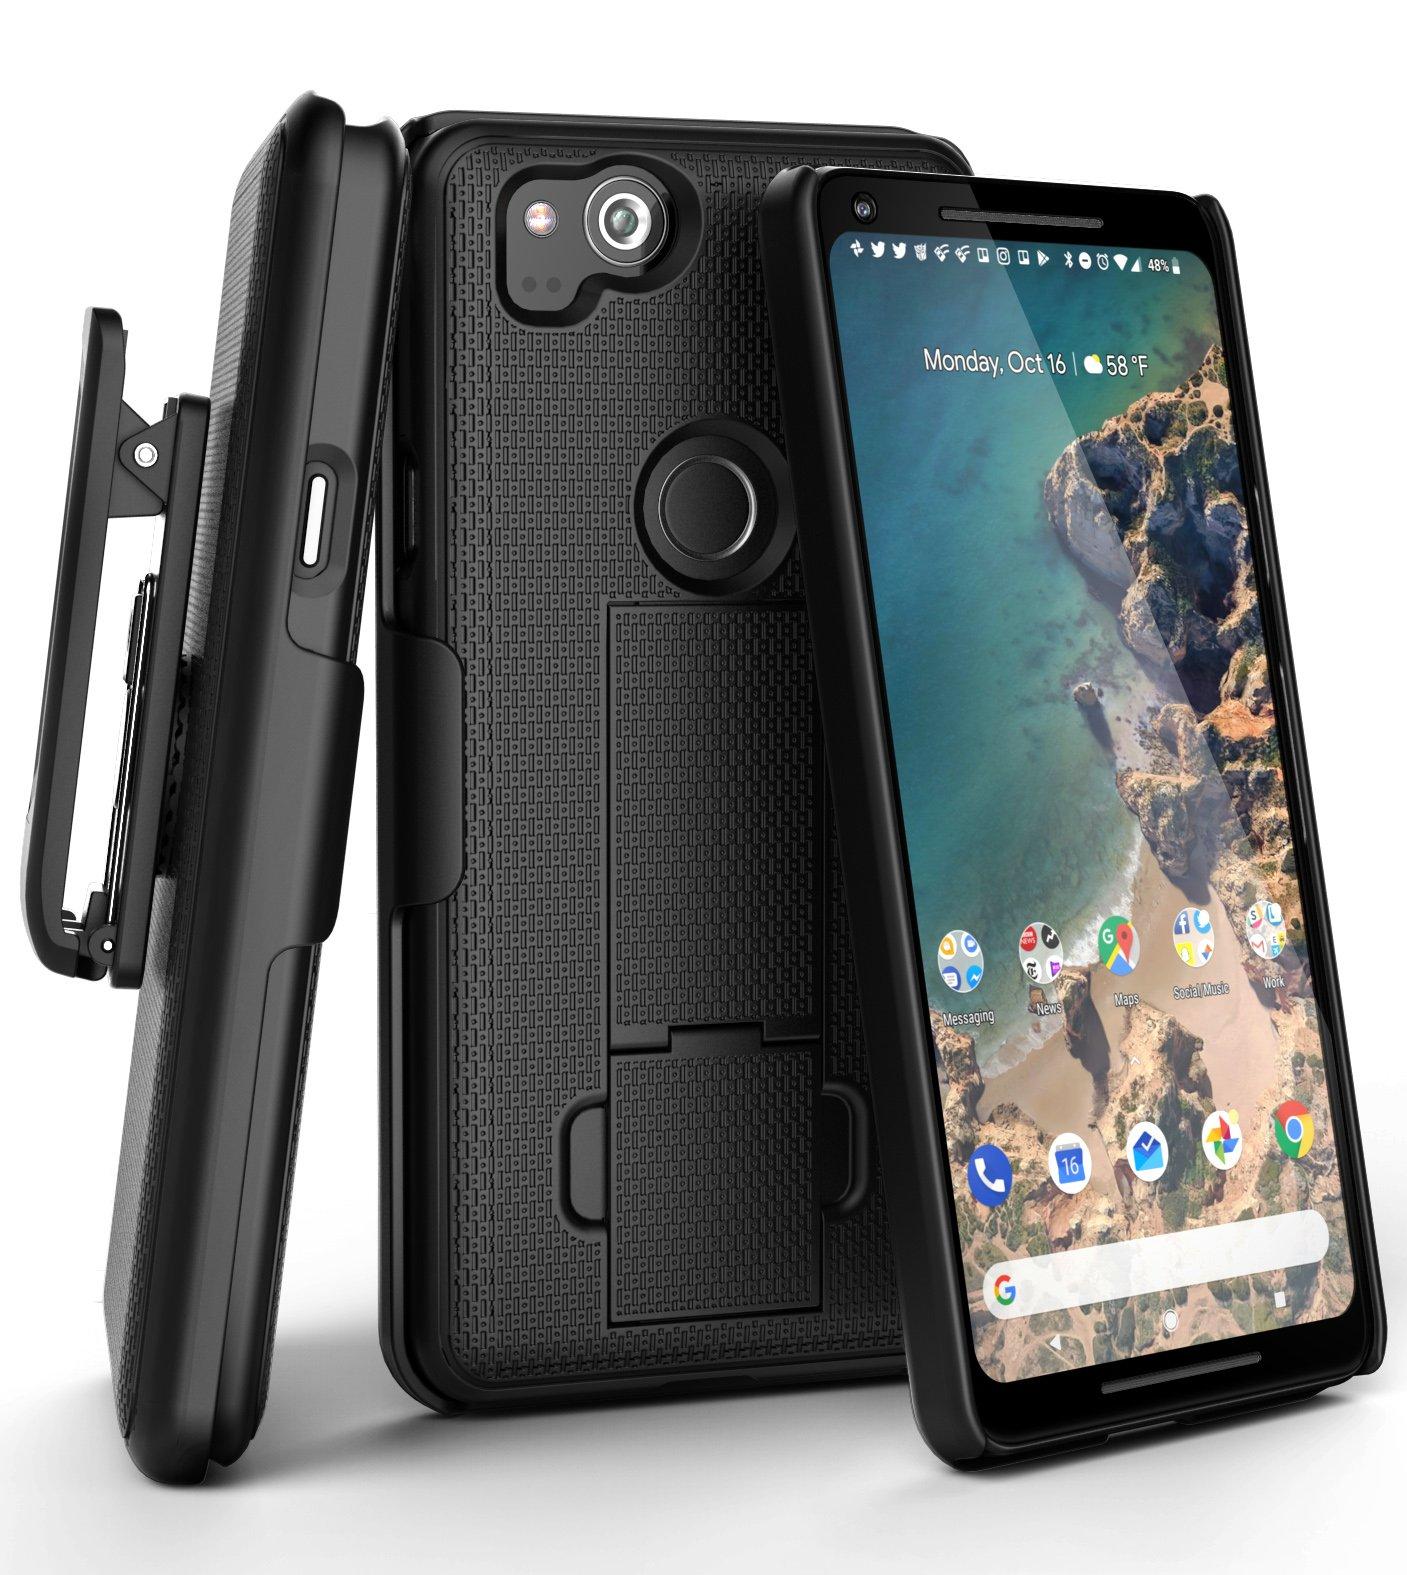 Google Pixel 2 XL Belt Clip Case, Encased (DuraClip) Slim Fit Holster Shell Combo (rubberized/non slip) Smooth Black